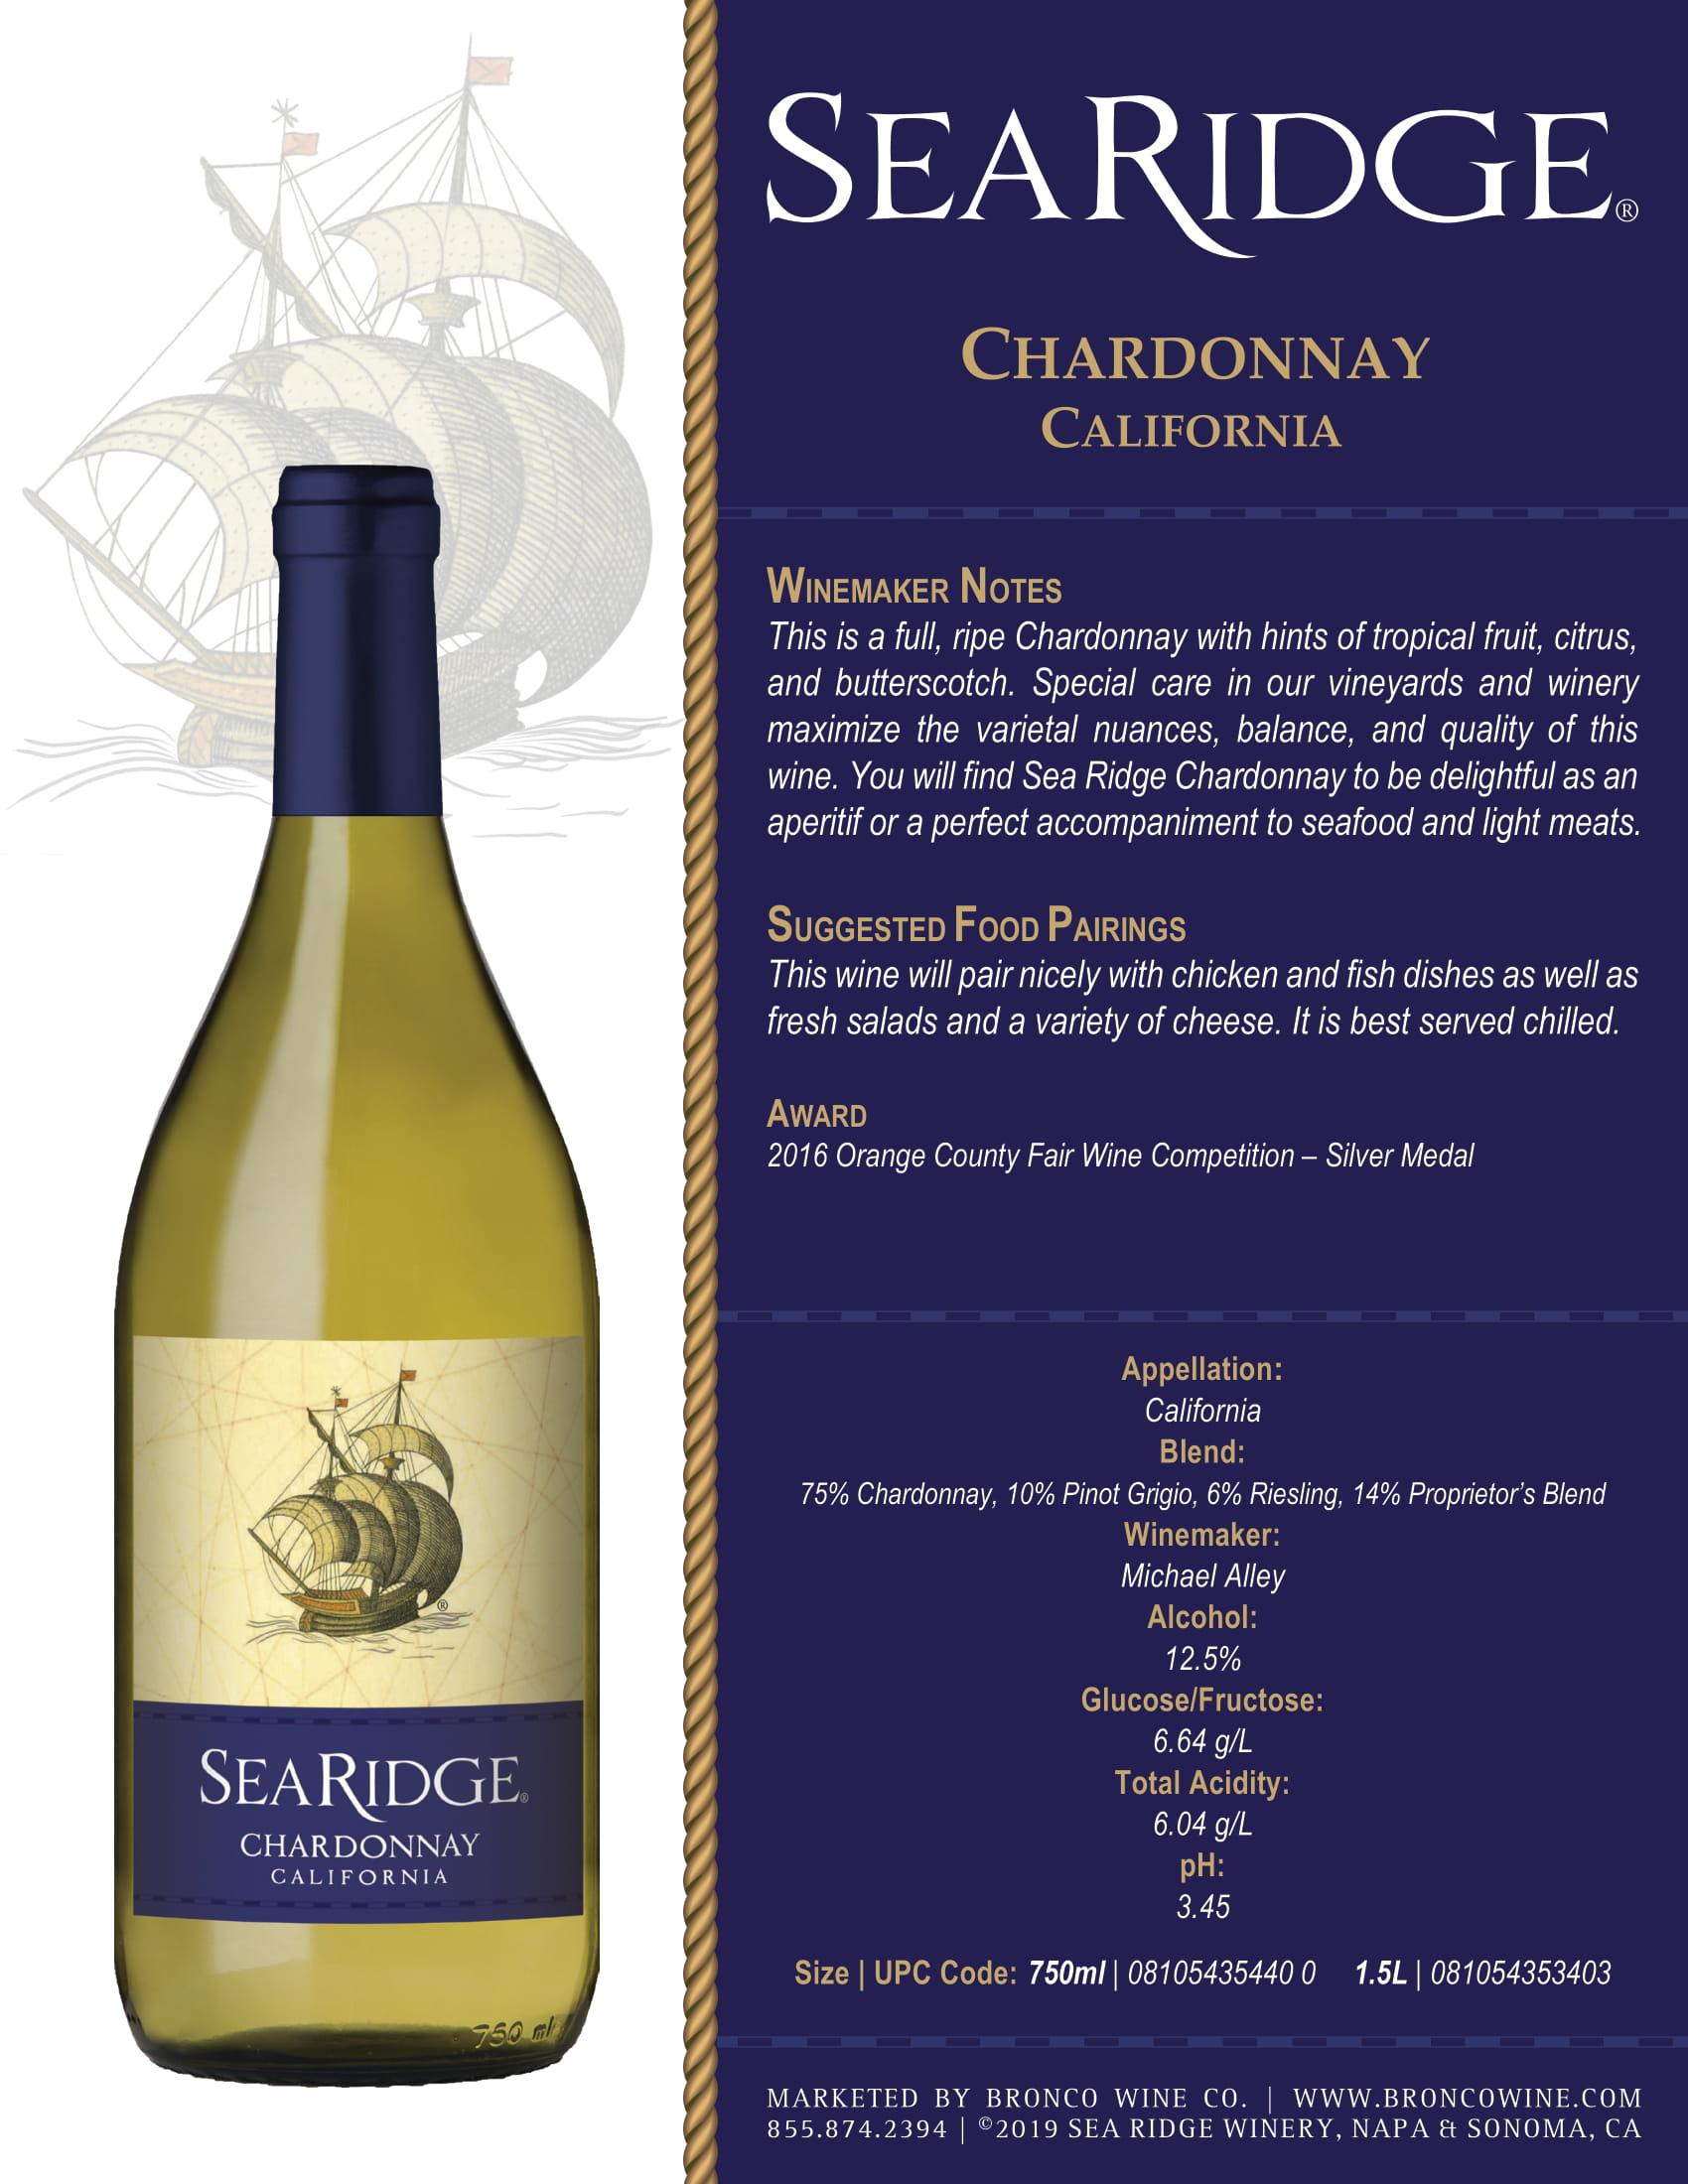 Sea Ridge Chardonnay Sell Sheet